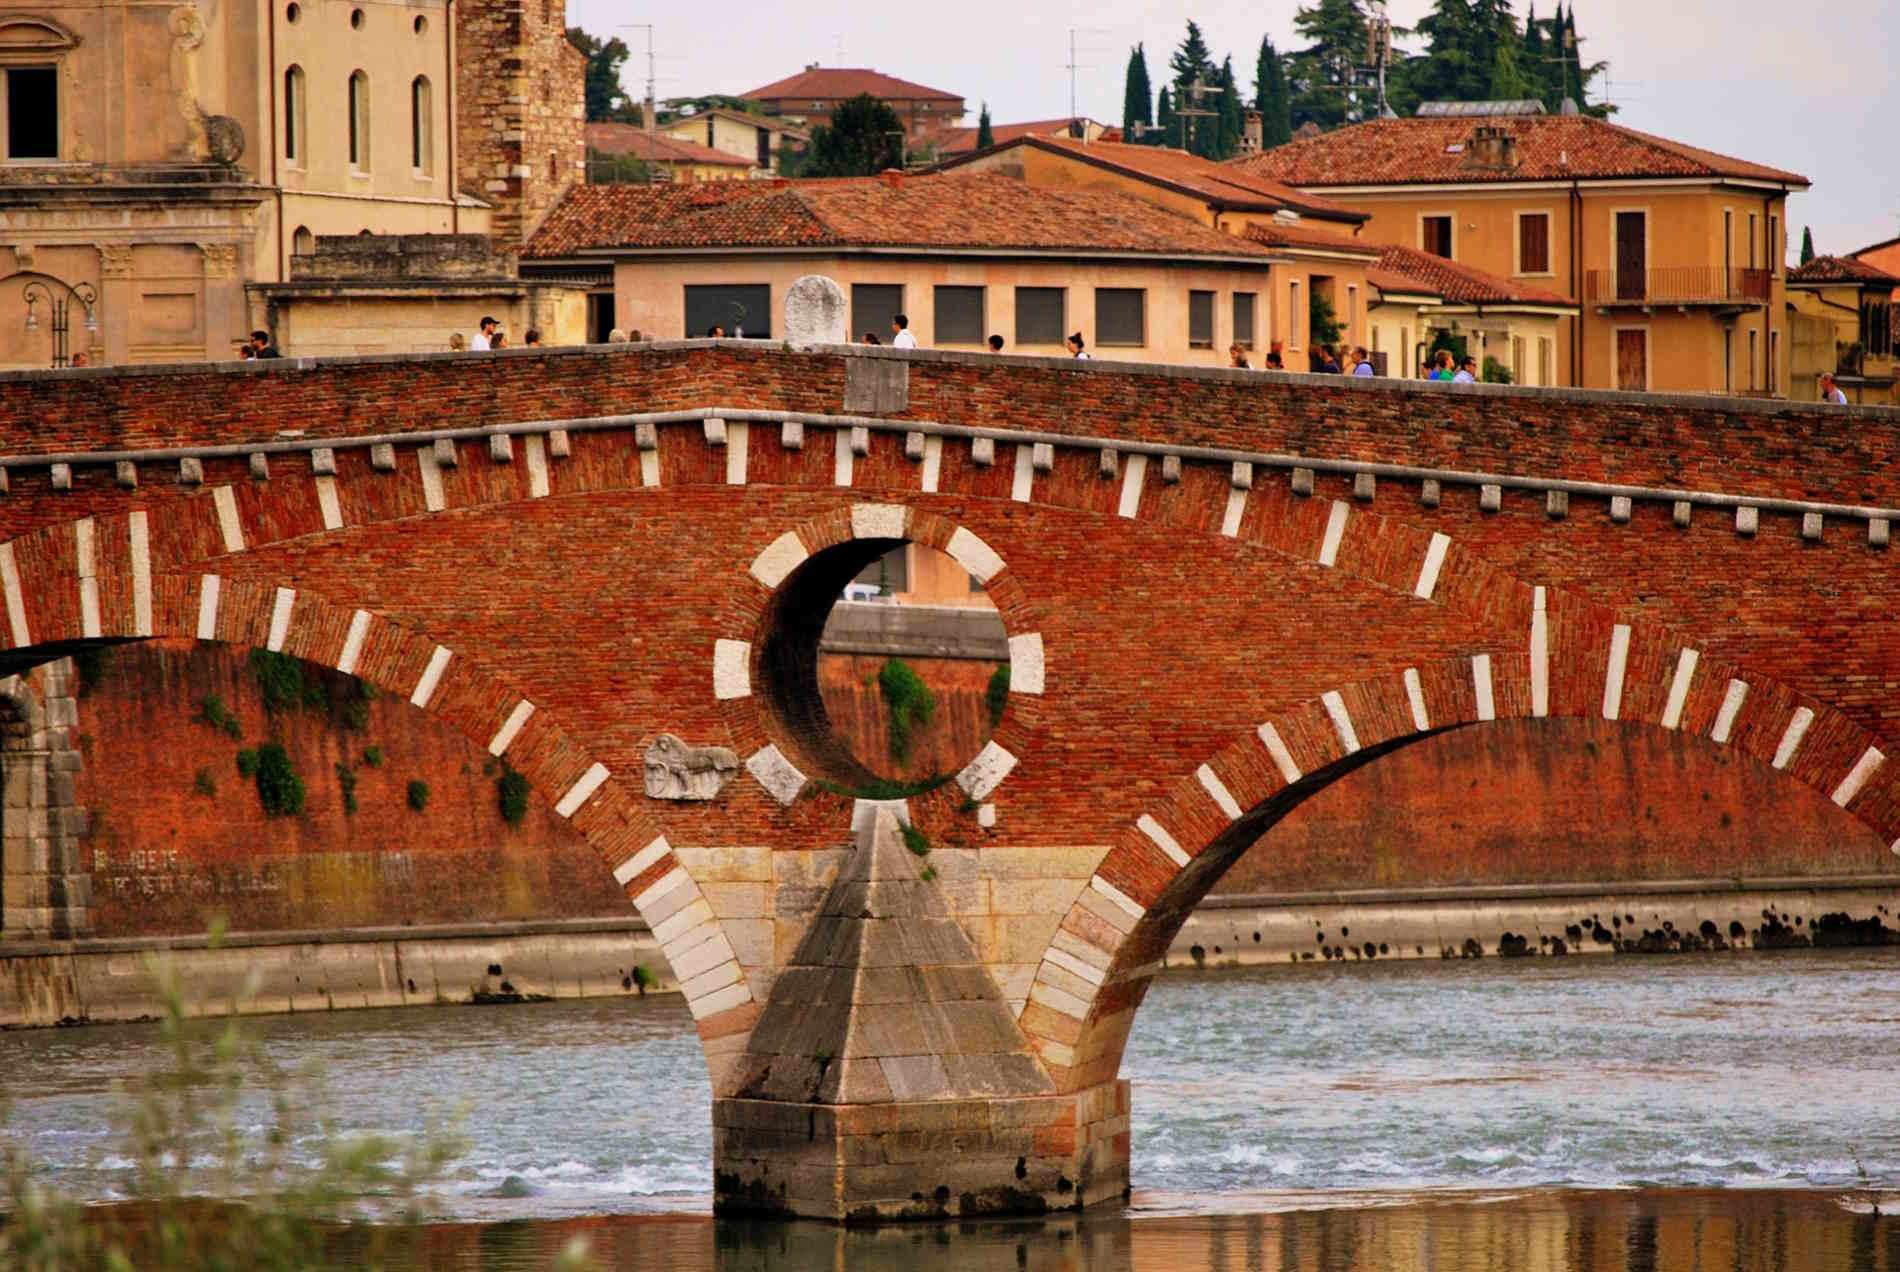 Particolari del ponte sull'Adige a Verona